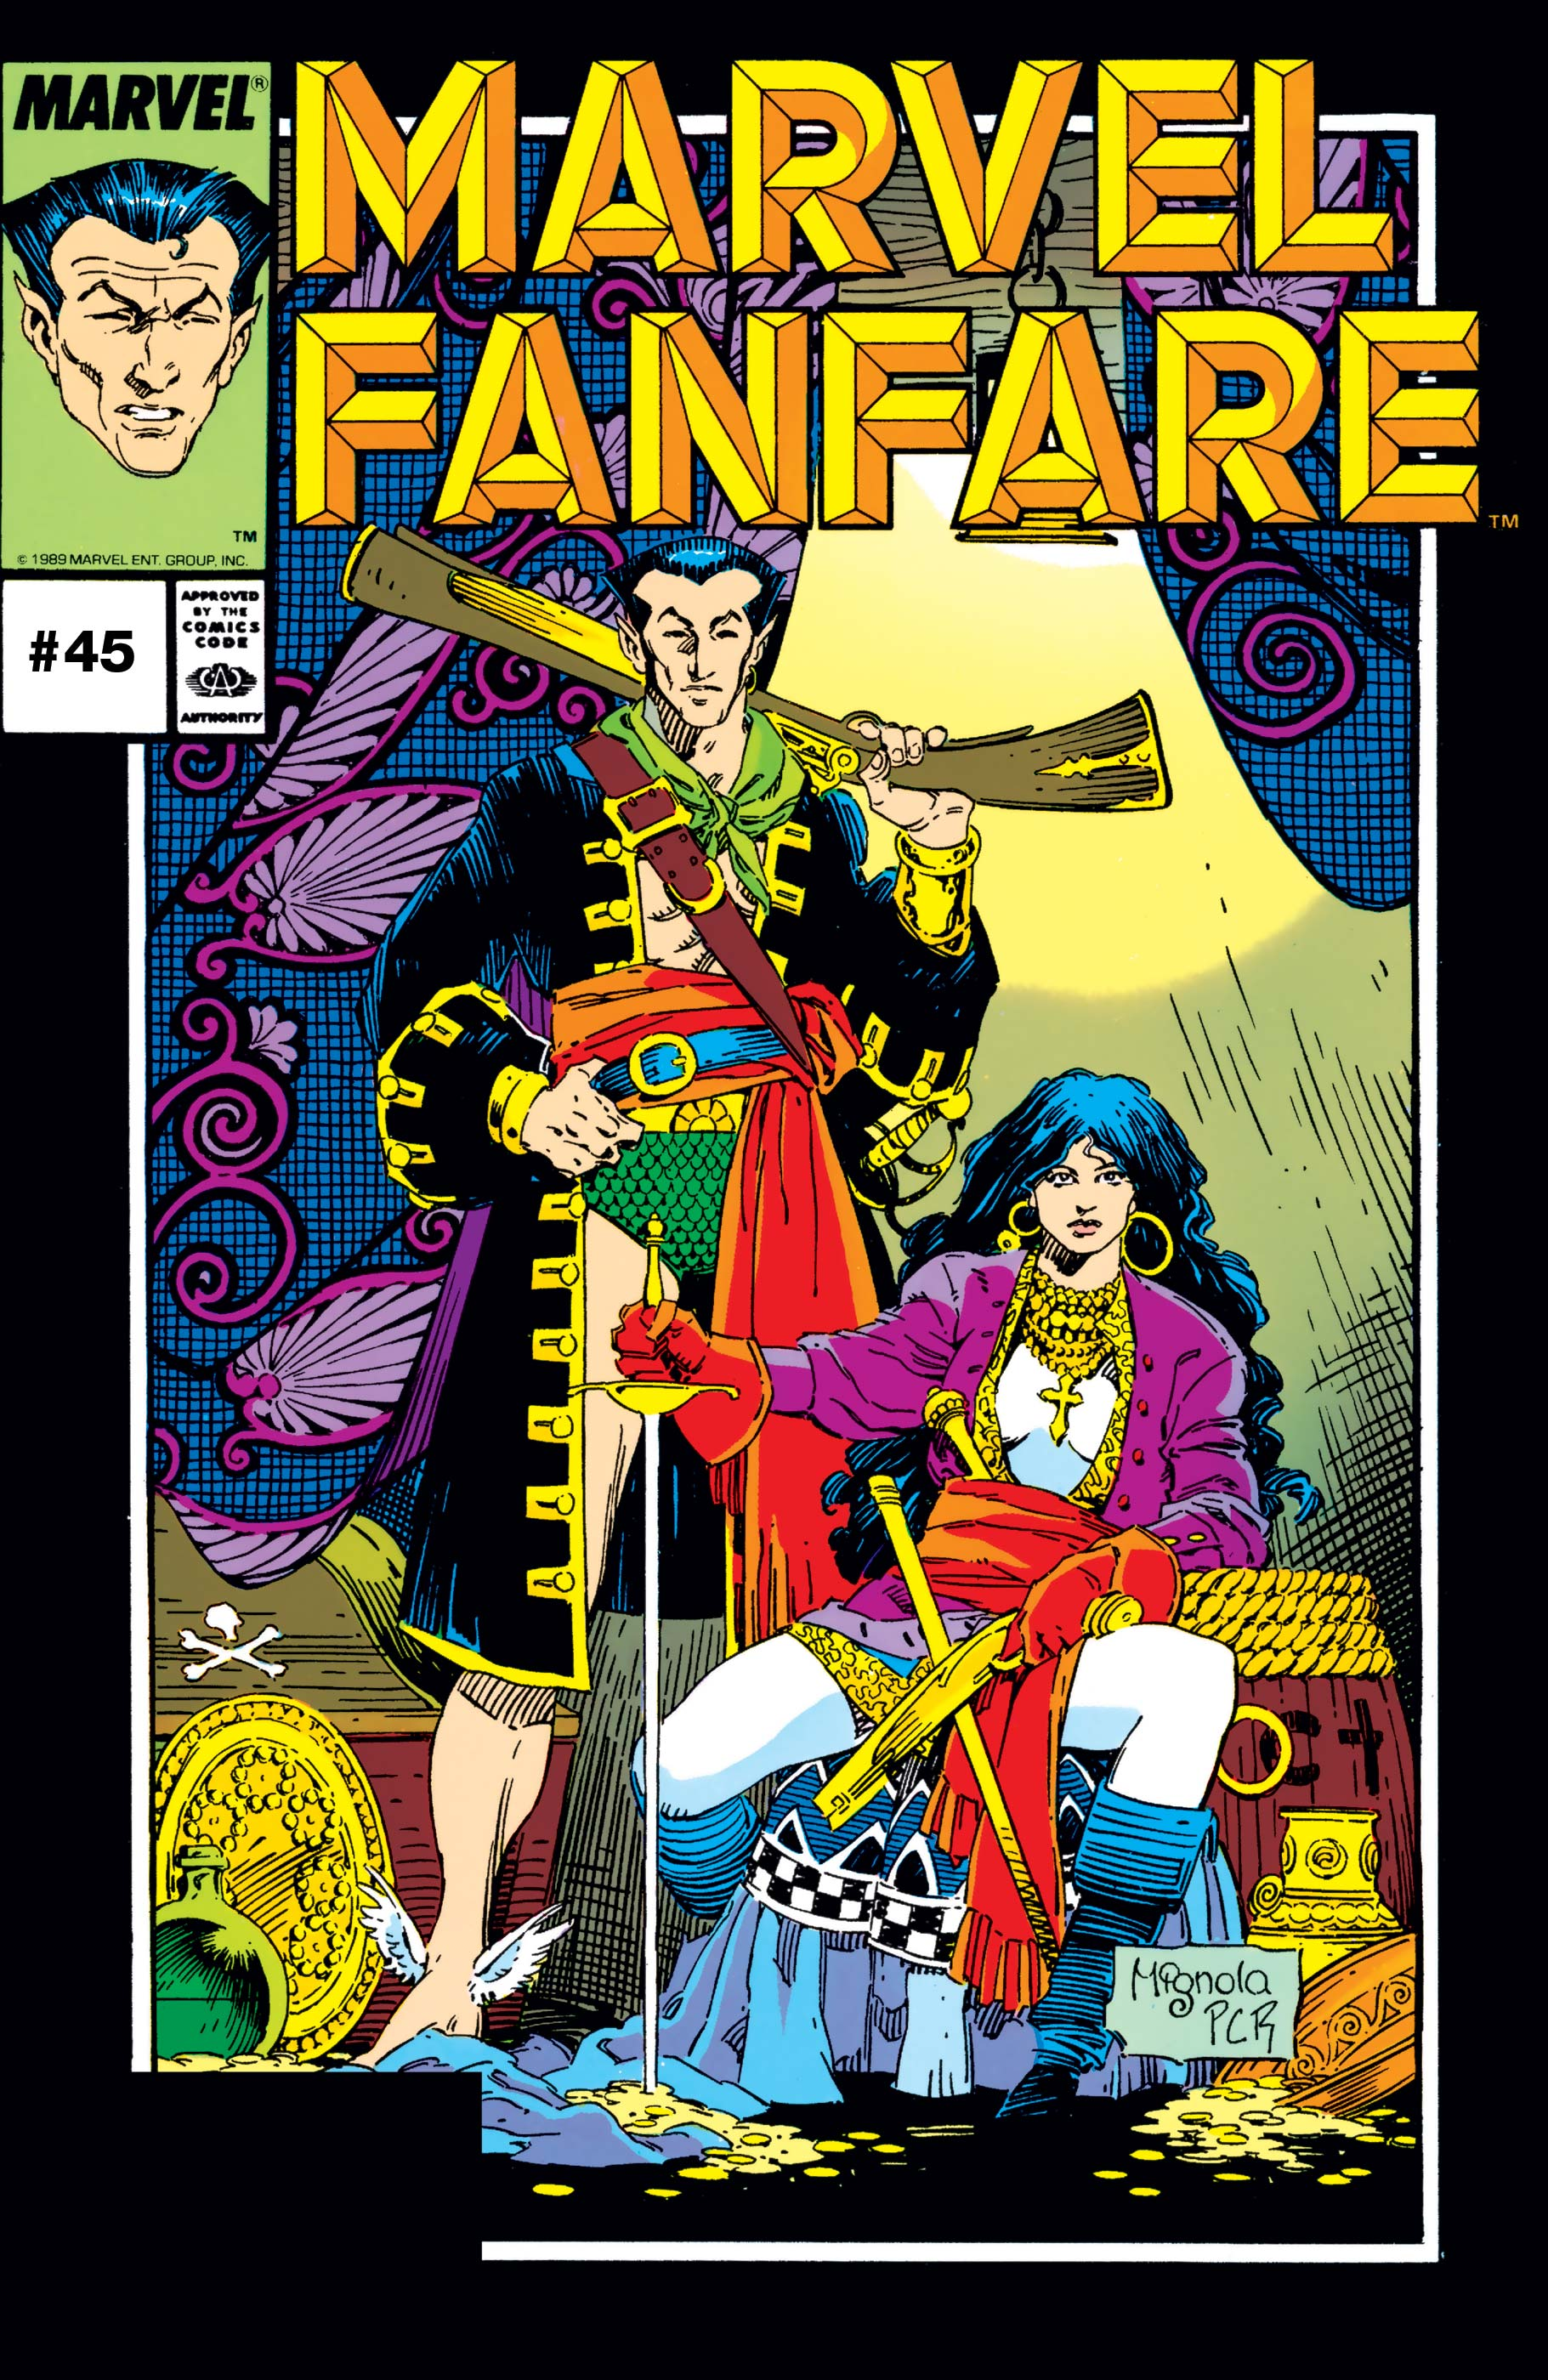 Marvel Fanfare (1982) #45